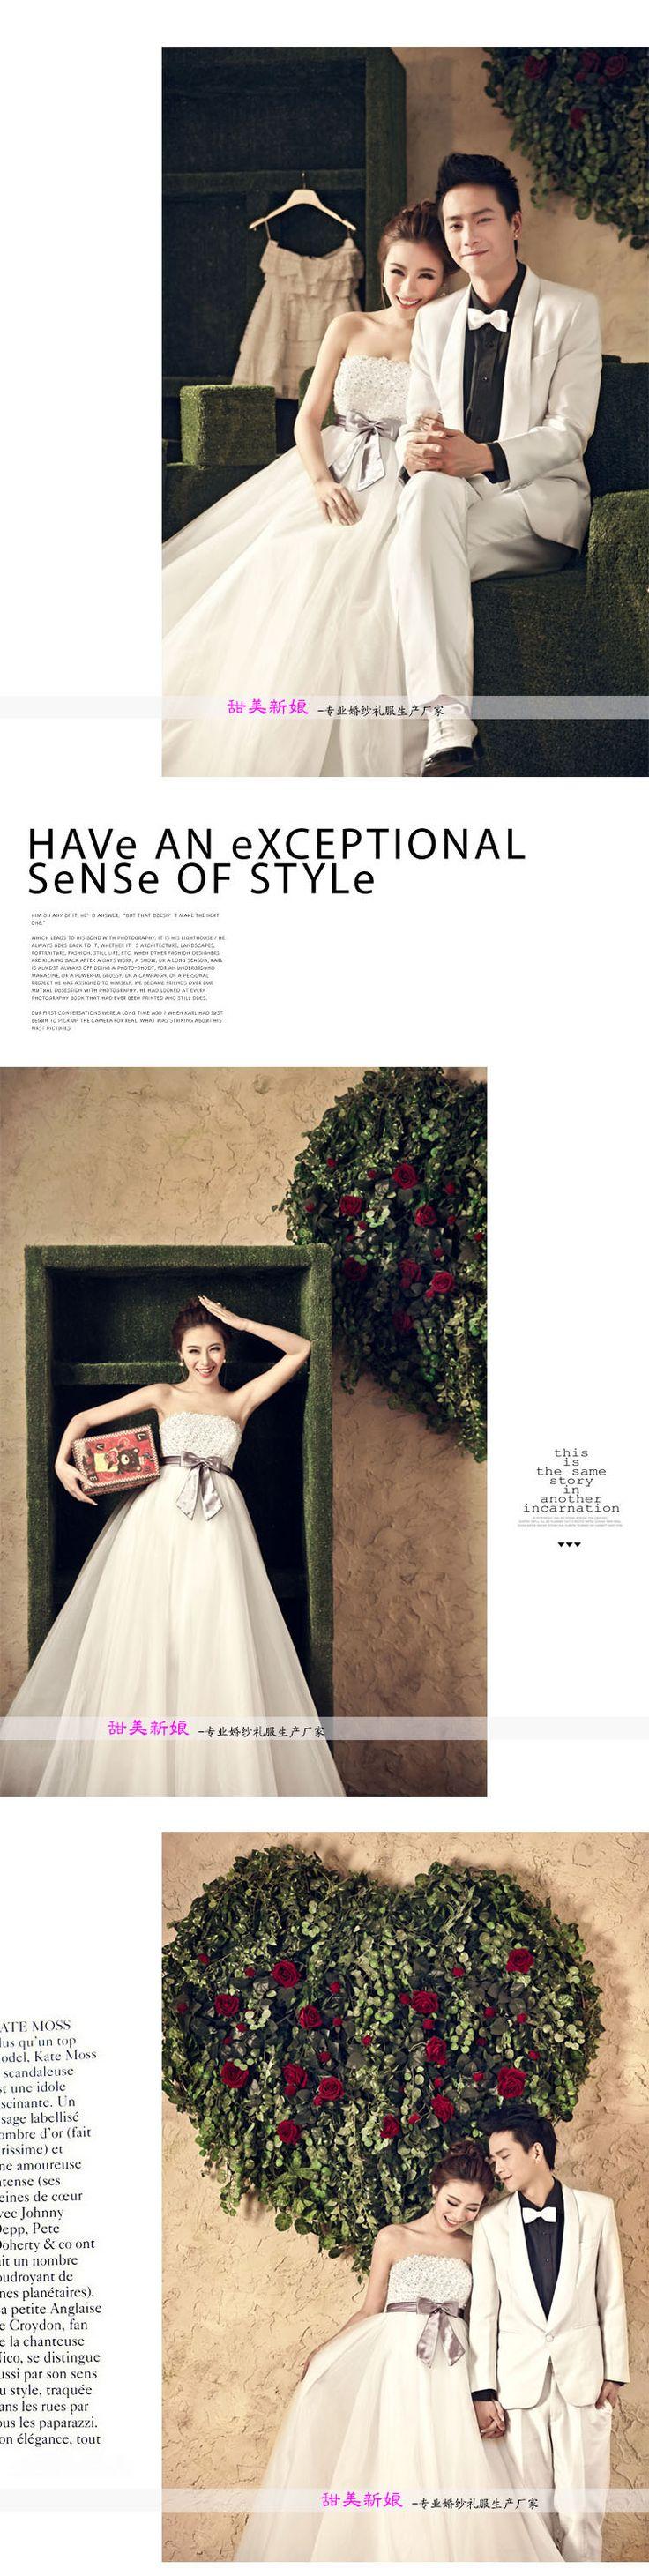 79 best wedding ideas :) images on Pinterest | Wedding dressses ...